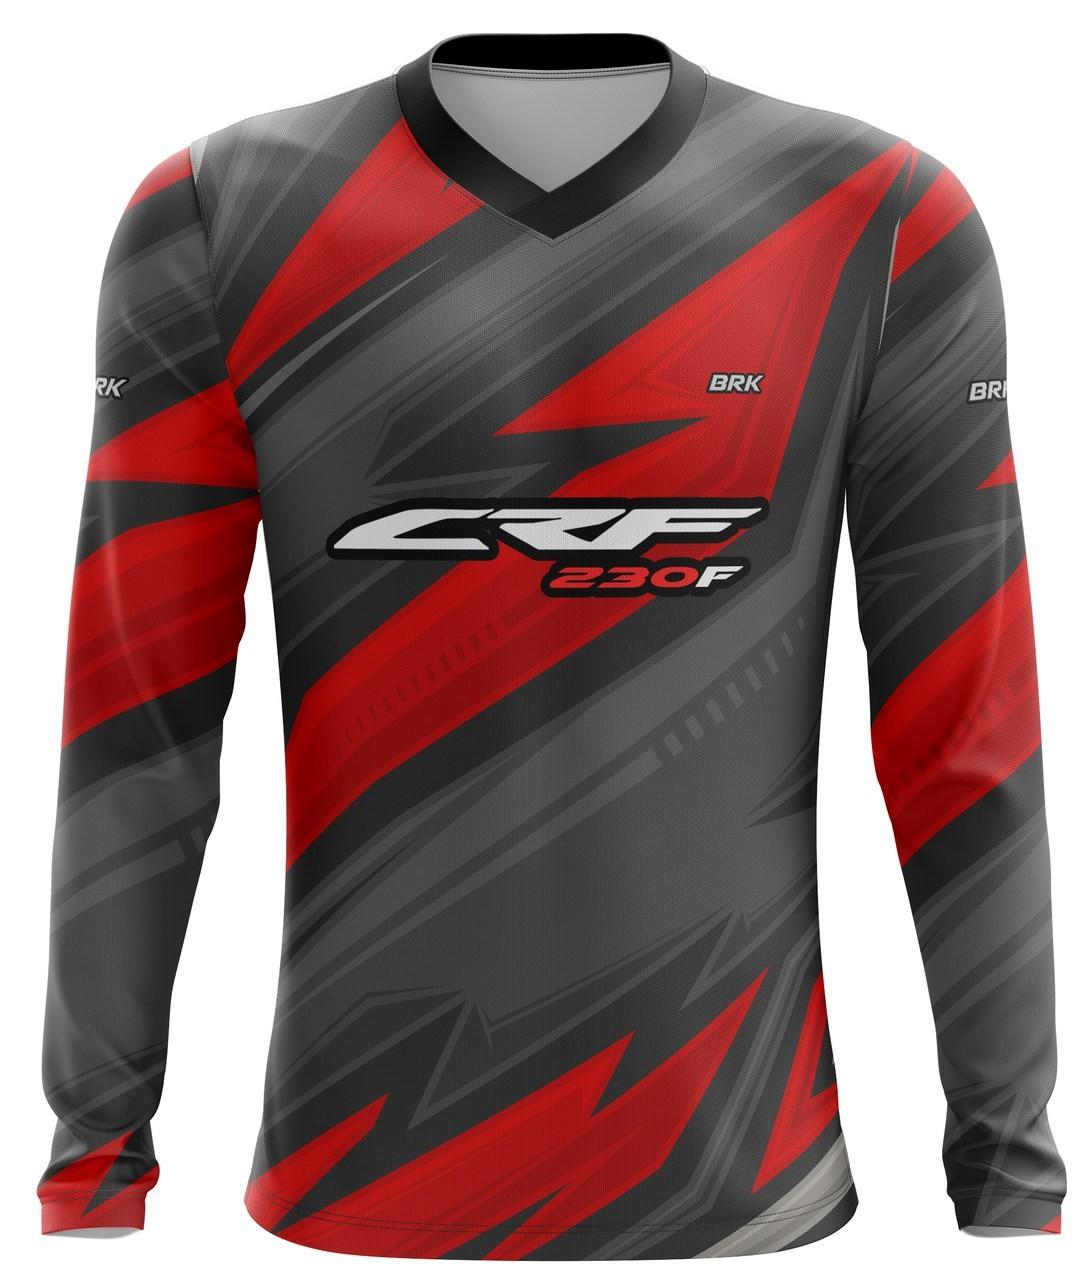 Camiseta Brk Motocross Honda CRF 230F com FPU 50+